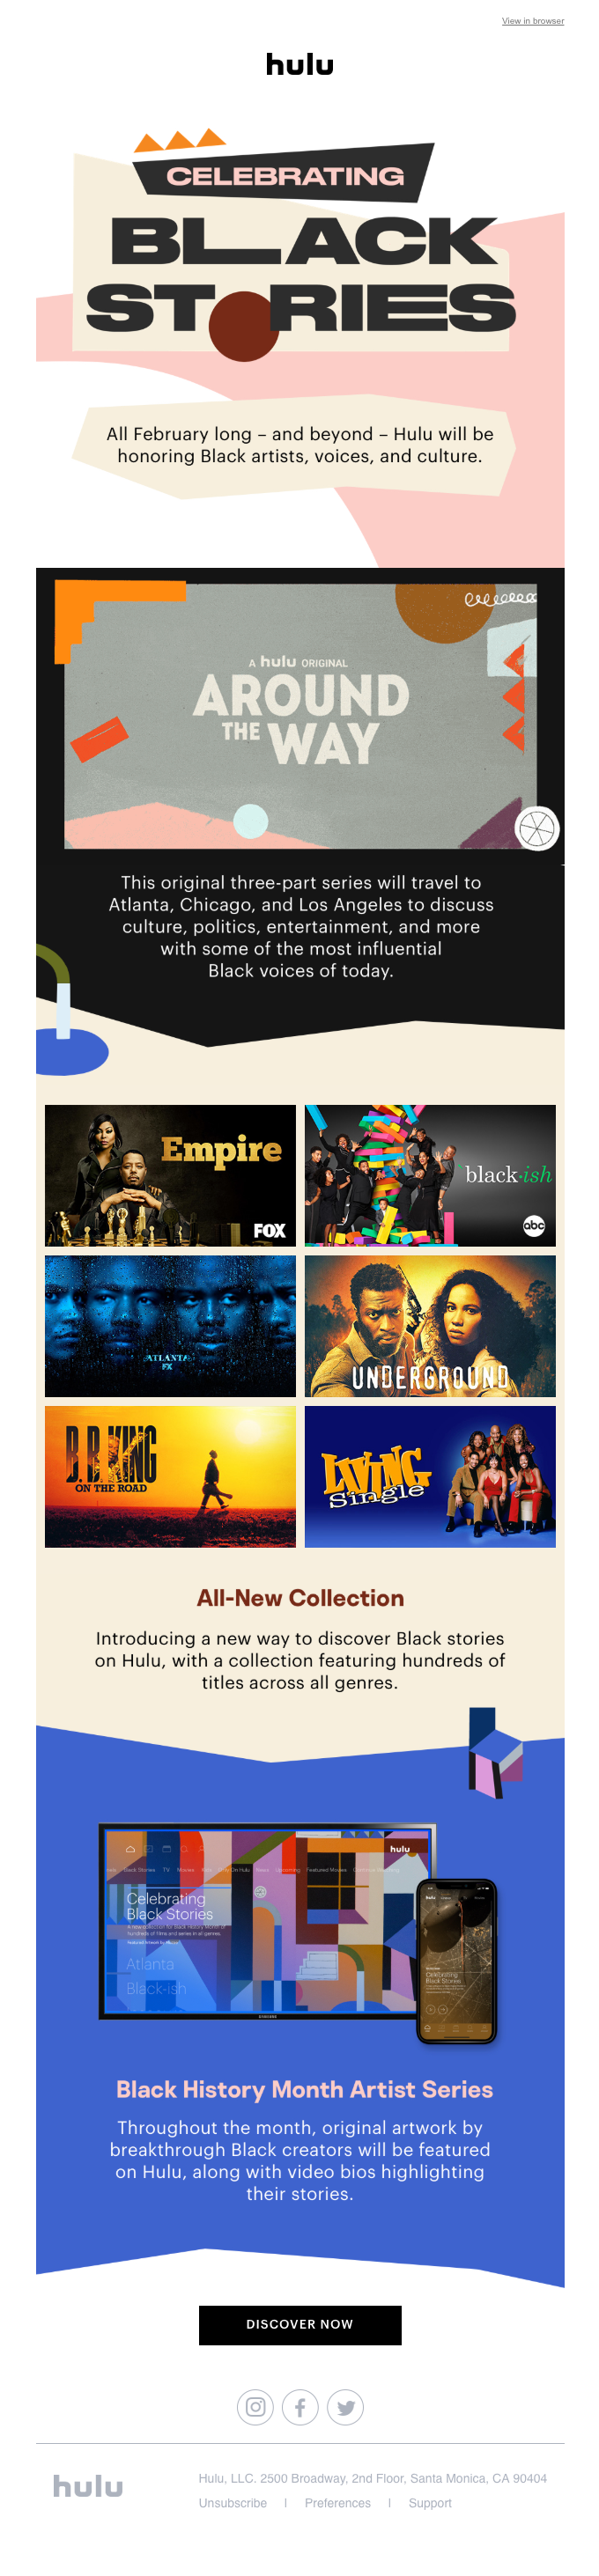 Hulu Celebrates Black History Month